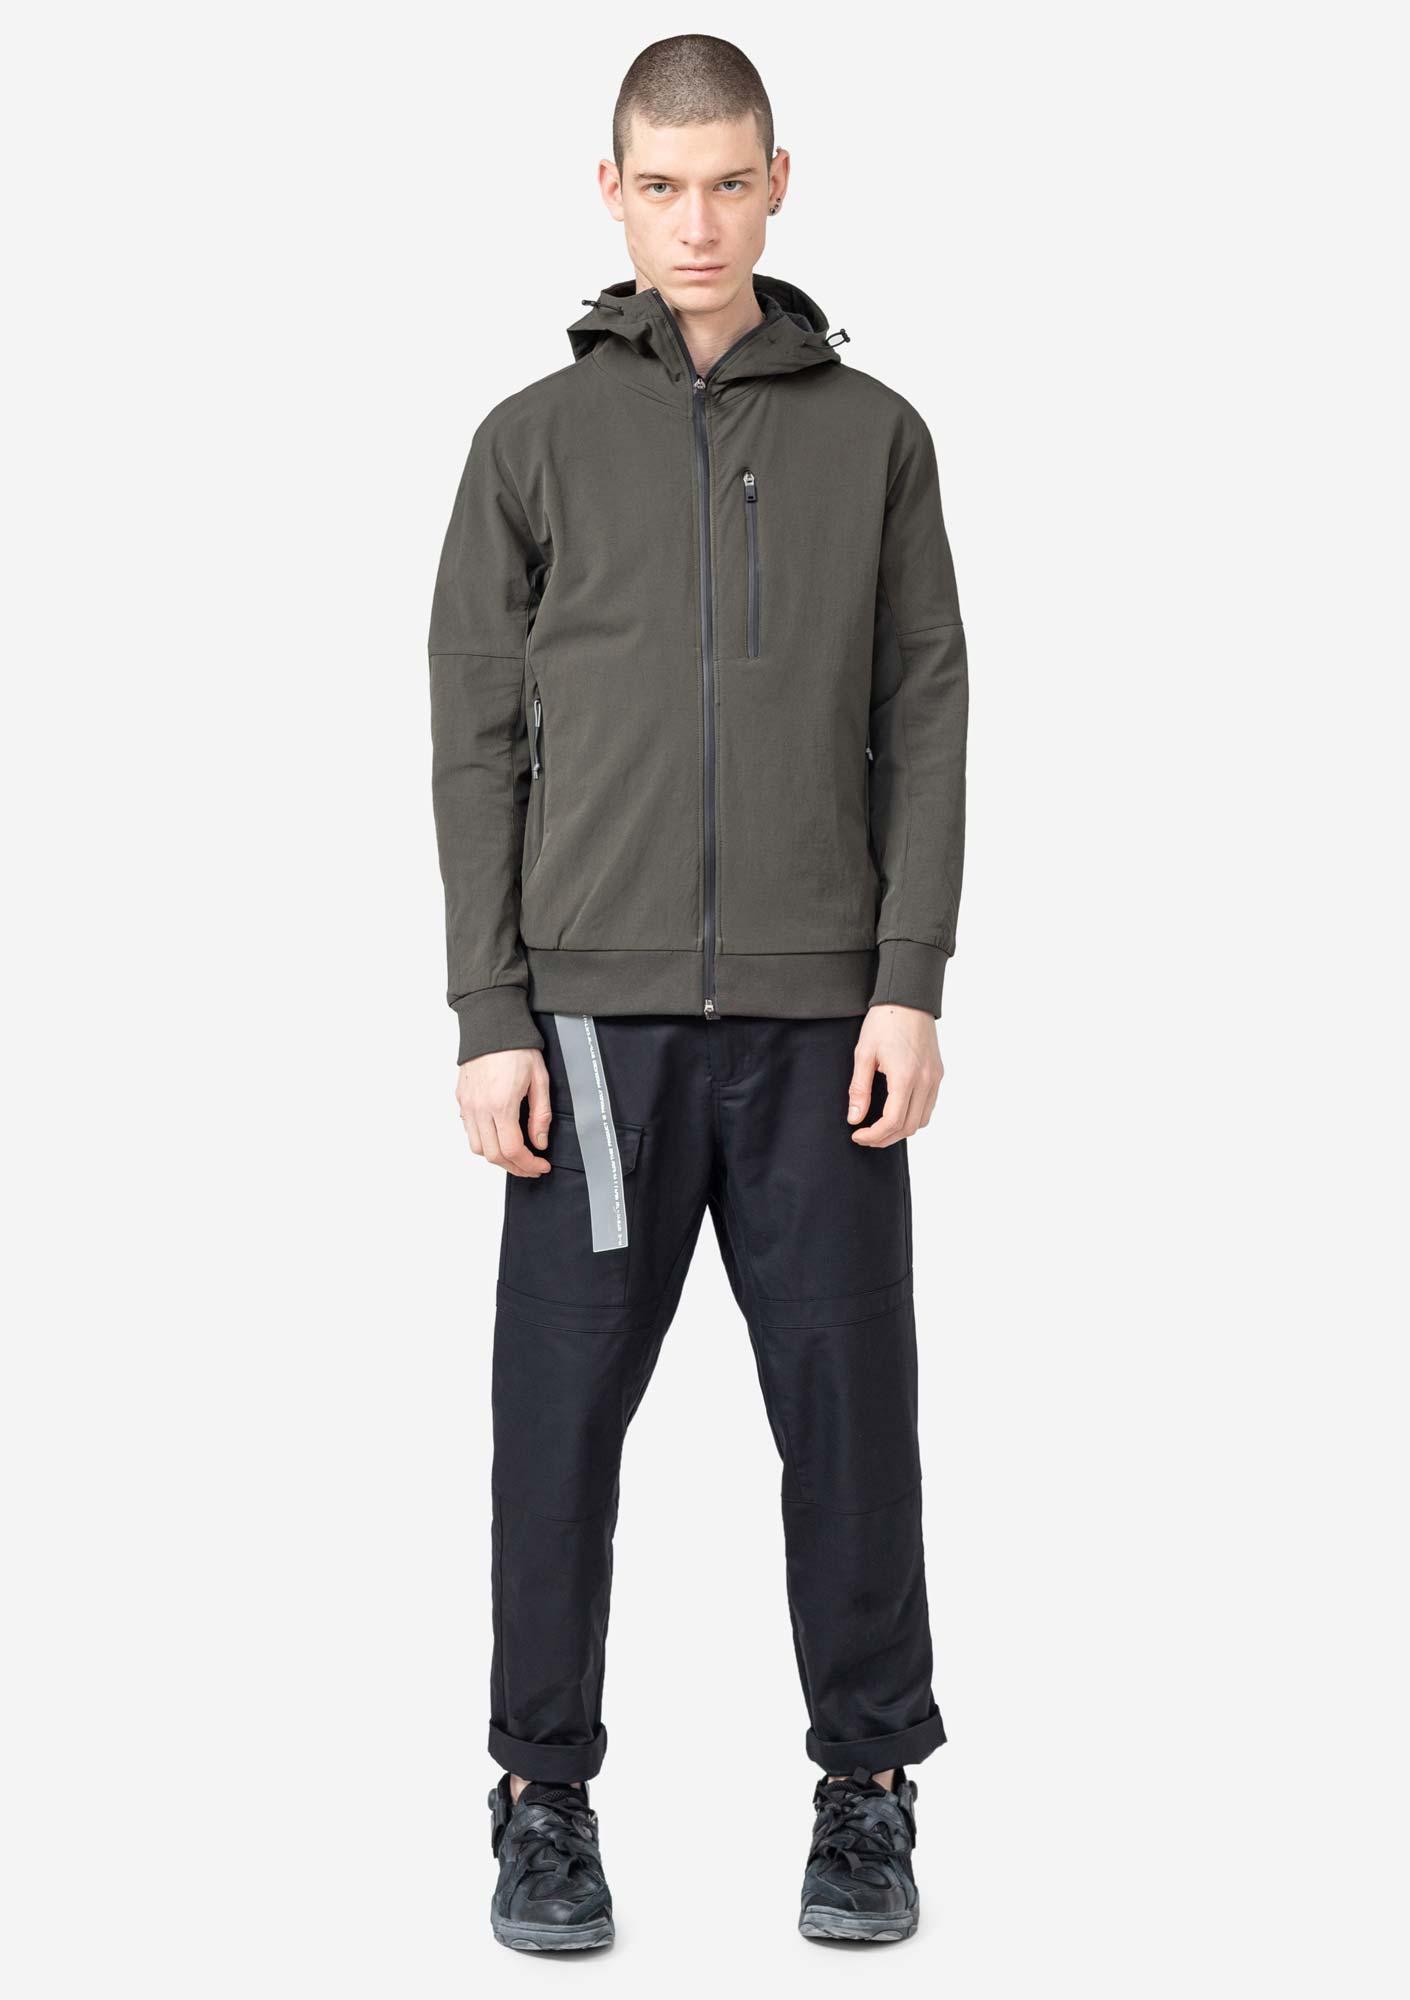 Эластичная куртка с капюшоном  KRAKATAU F50/5